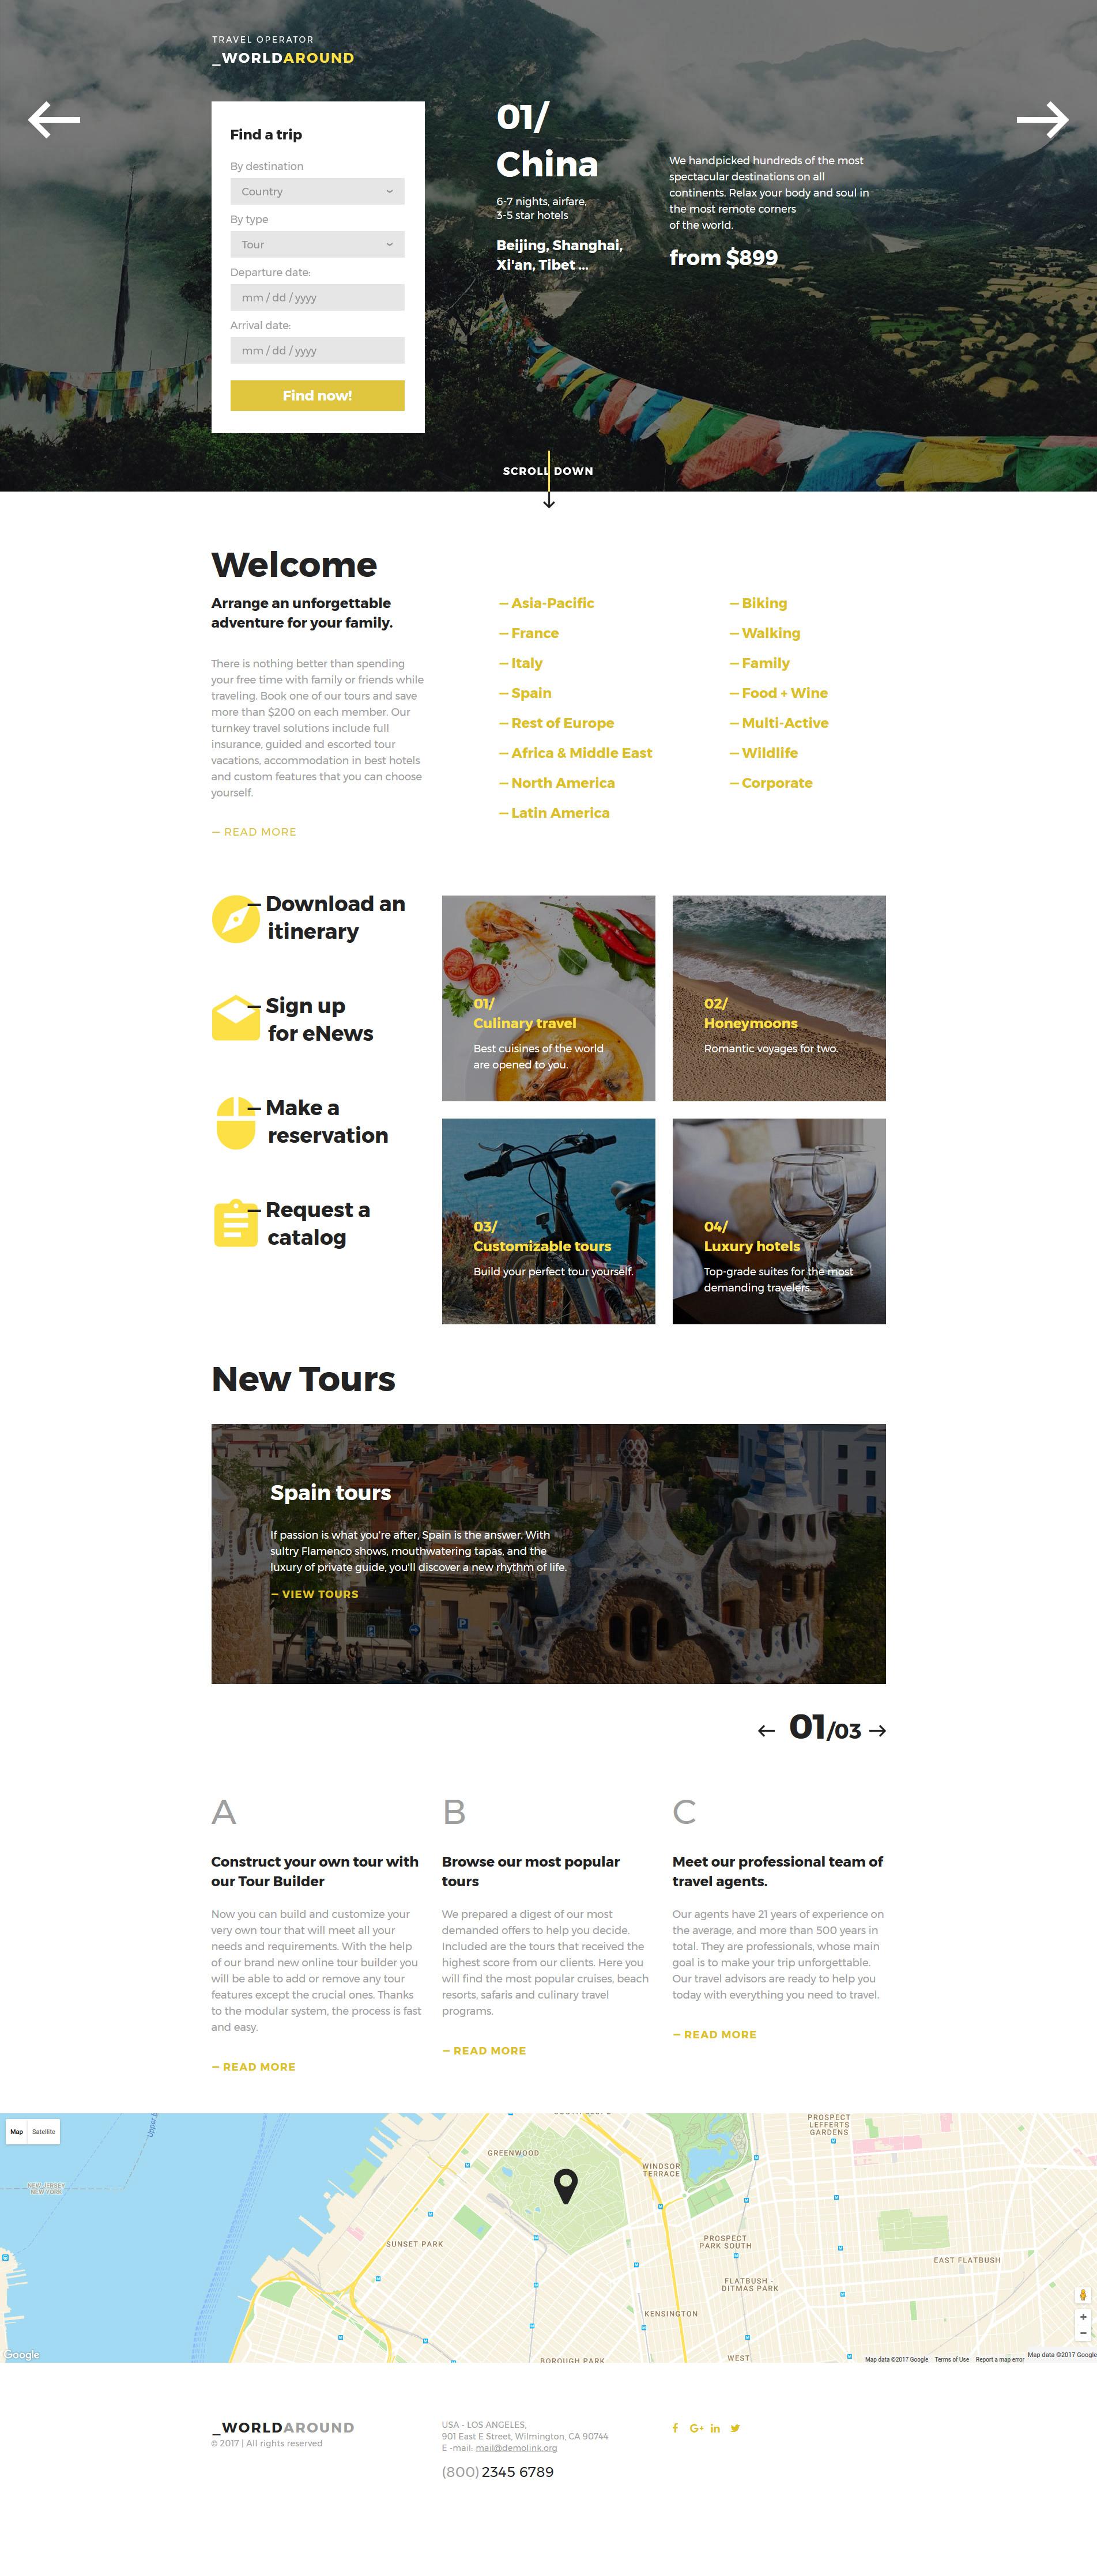 WorldAround - Travel Operator Landing Page Template